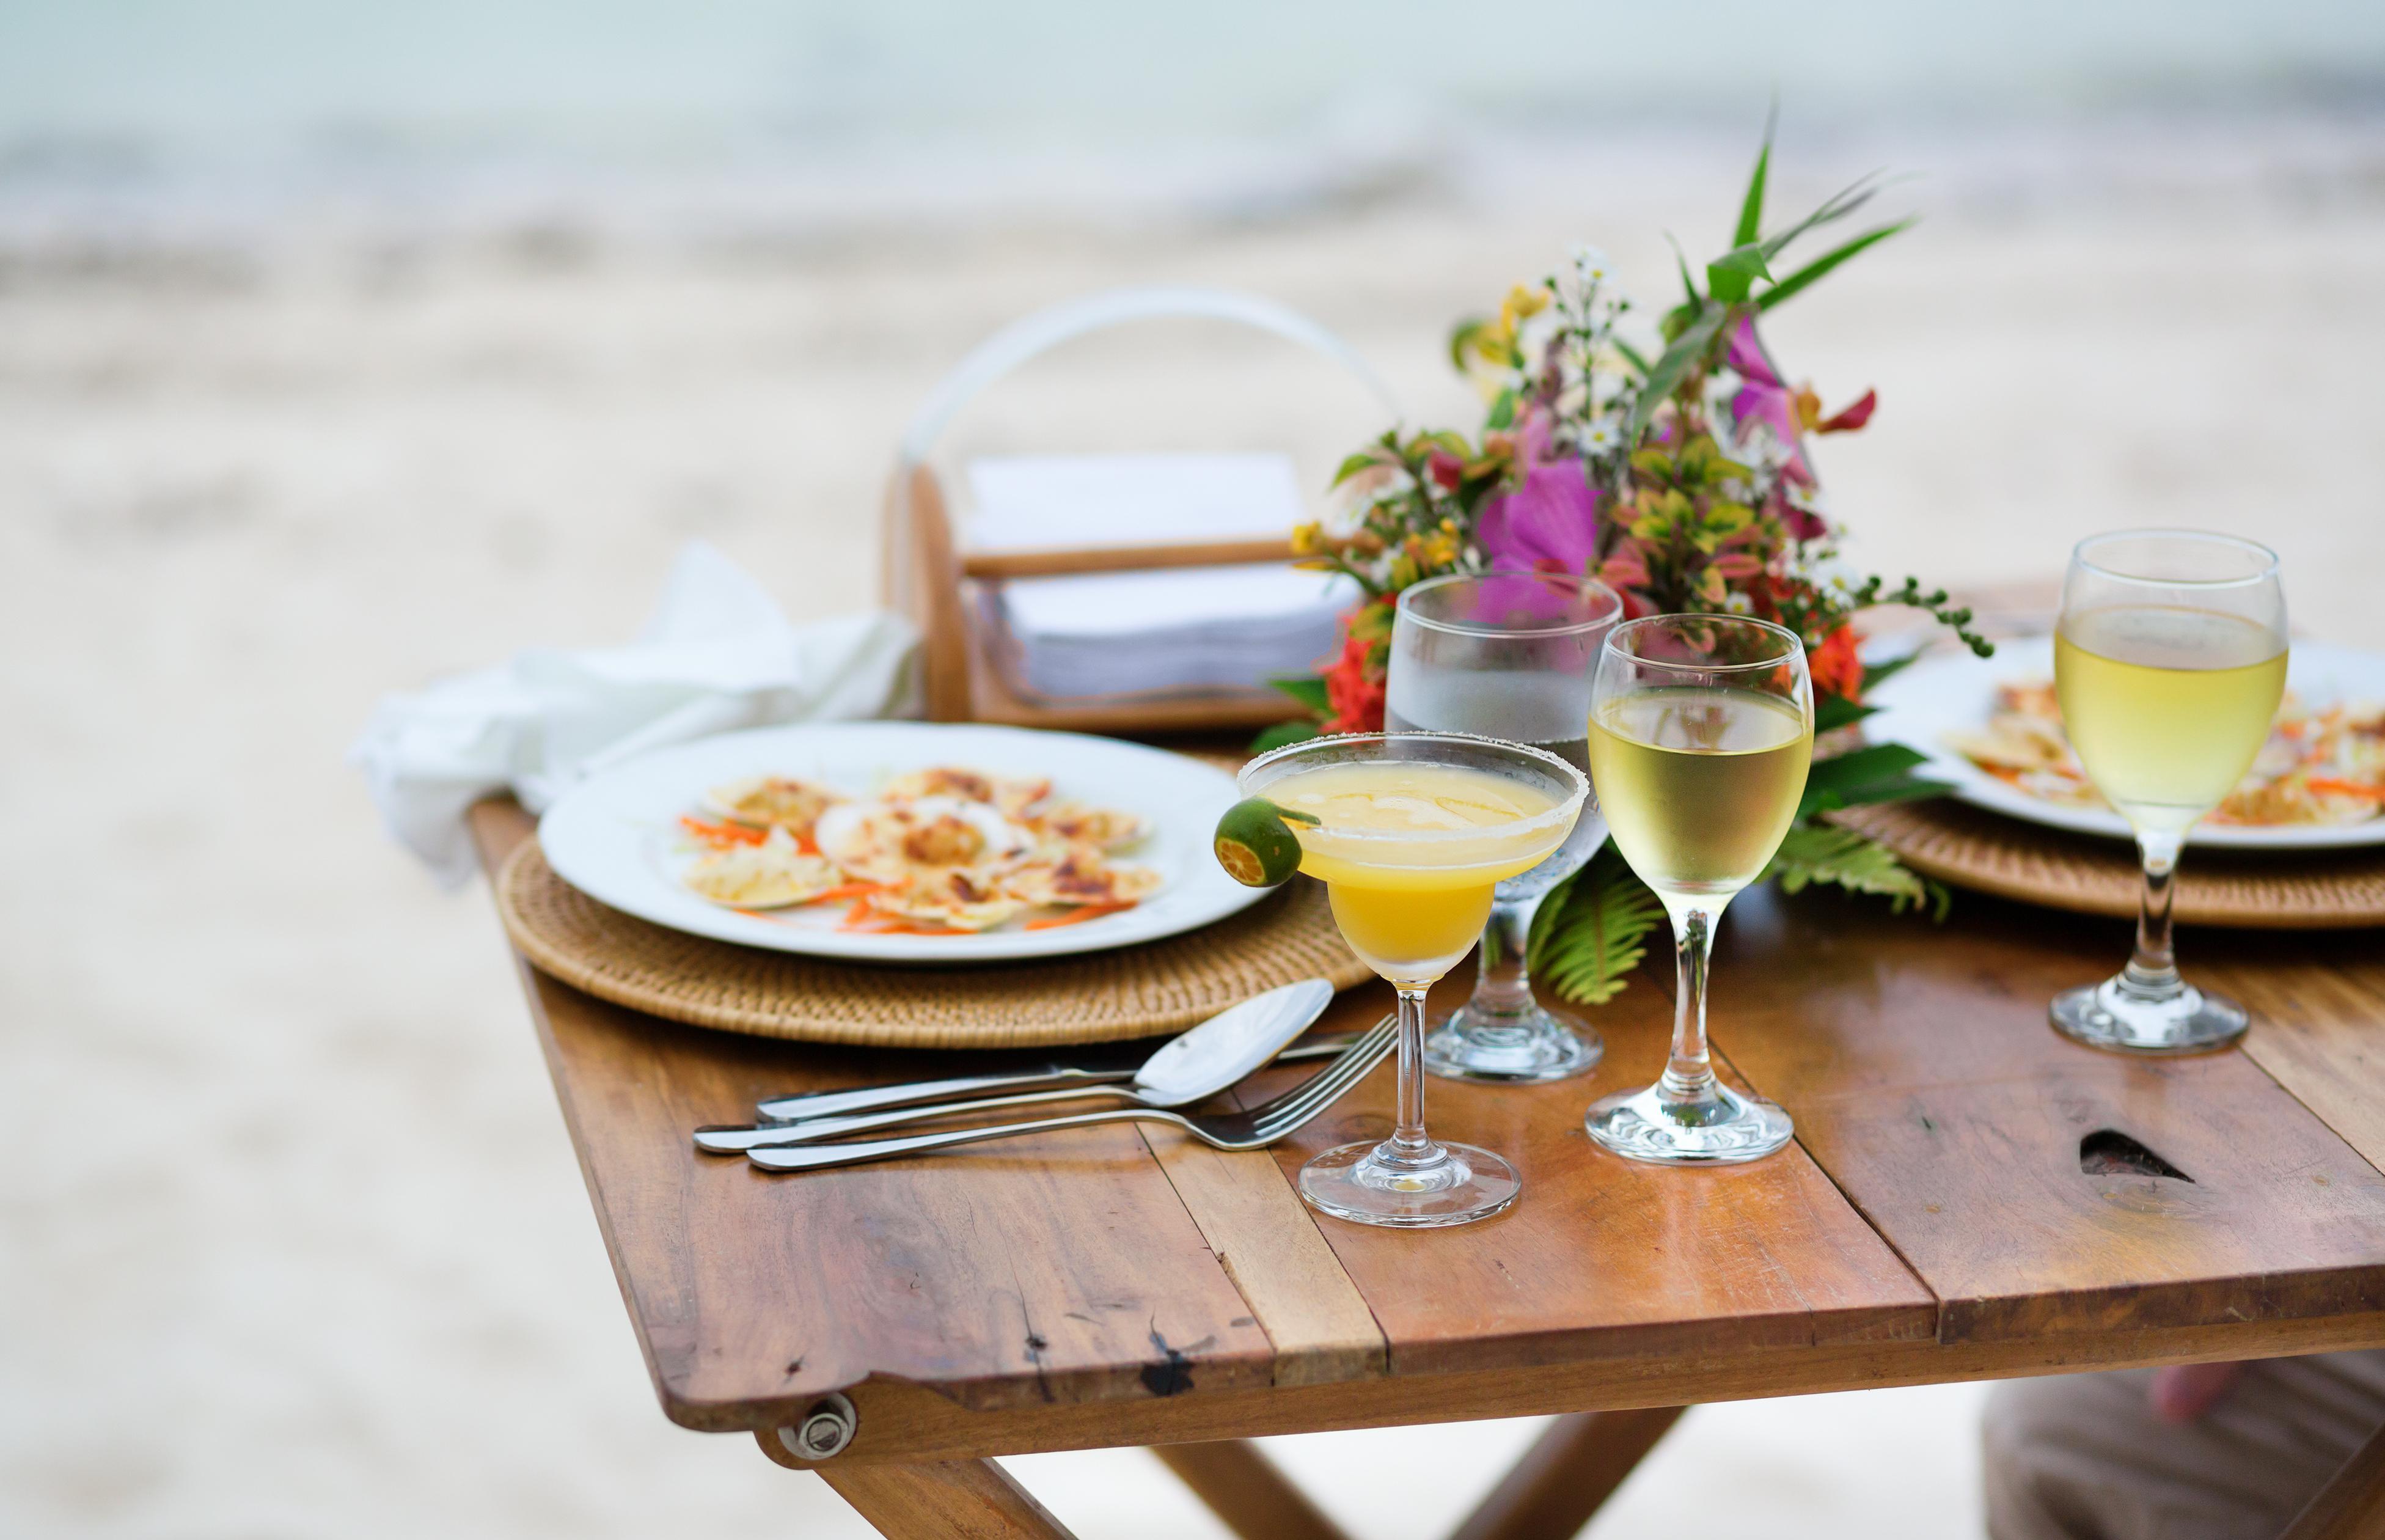 costa brava 39 s best beachfront bars and restaurants lfstyle. Black Bedroom Furniture Sets. Home Design Ideas